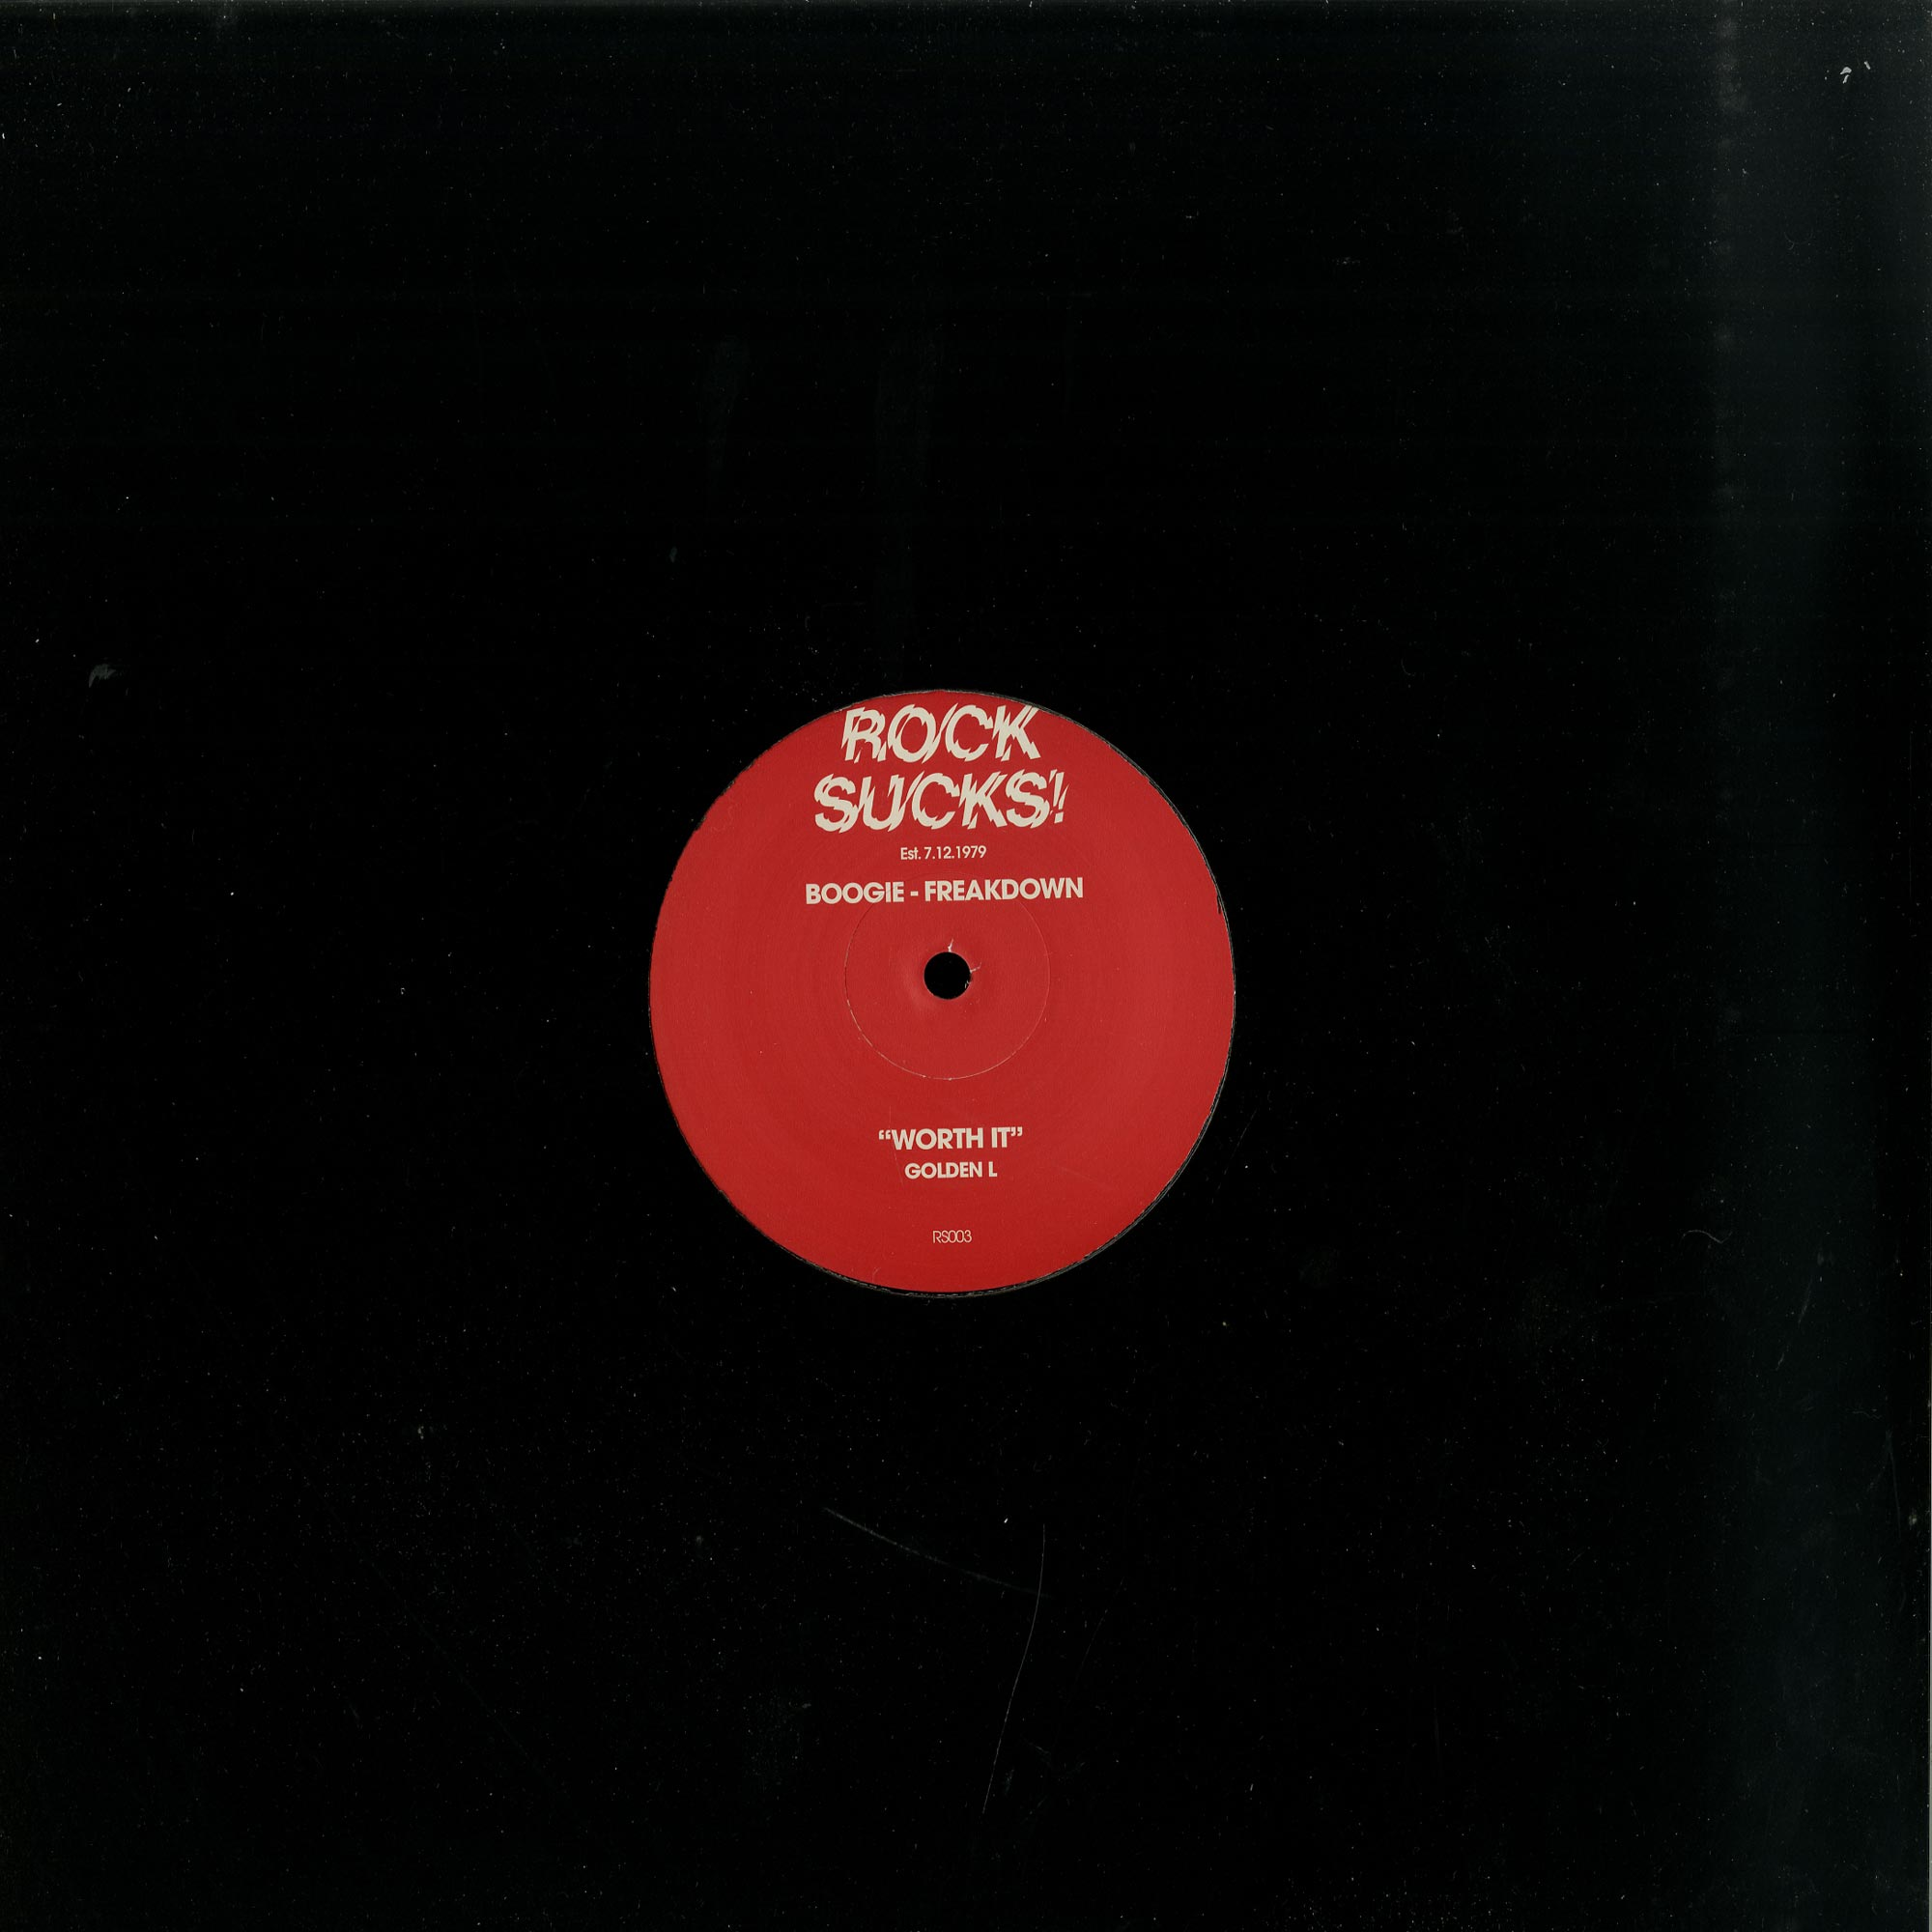 Boogie / Cason / Leisa - FREAKDOWN